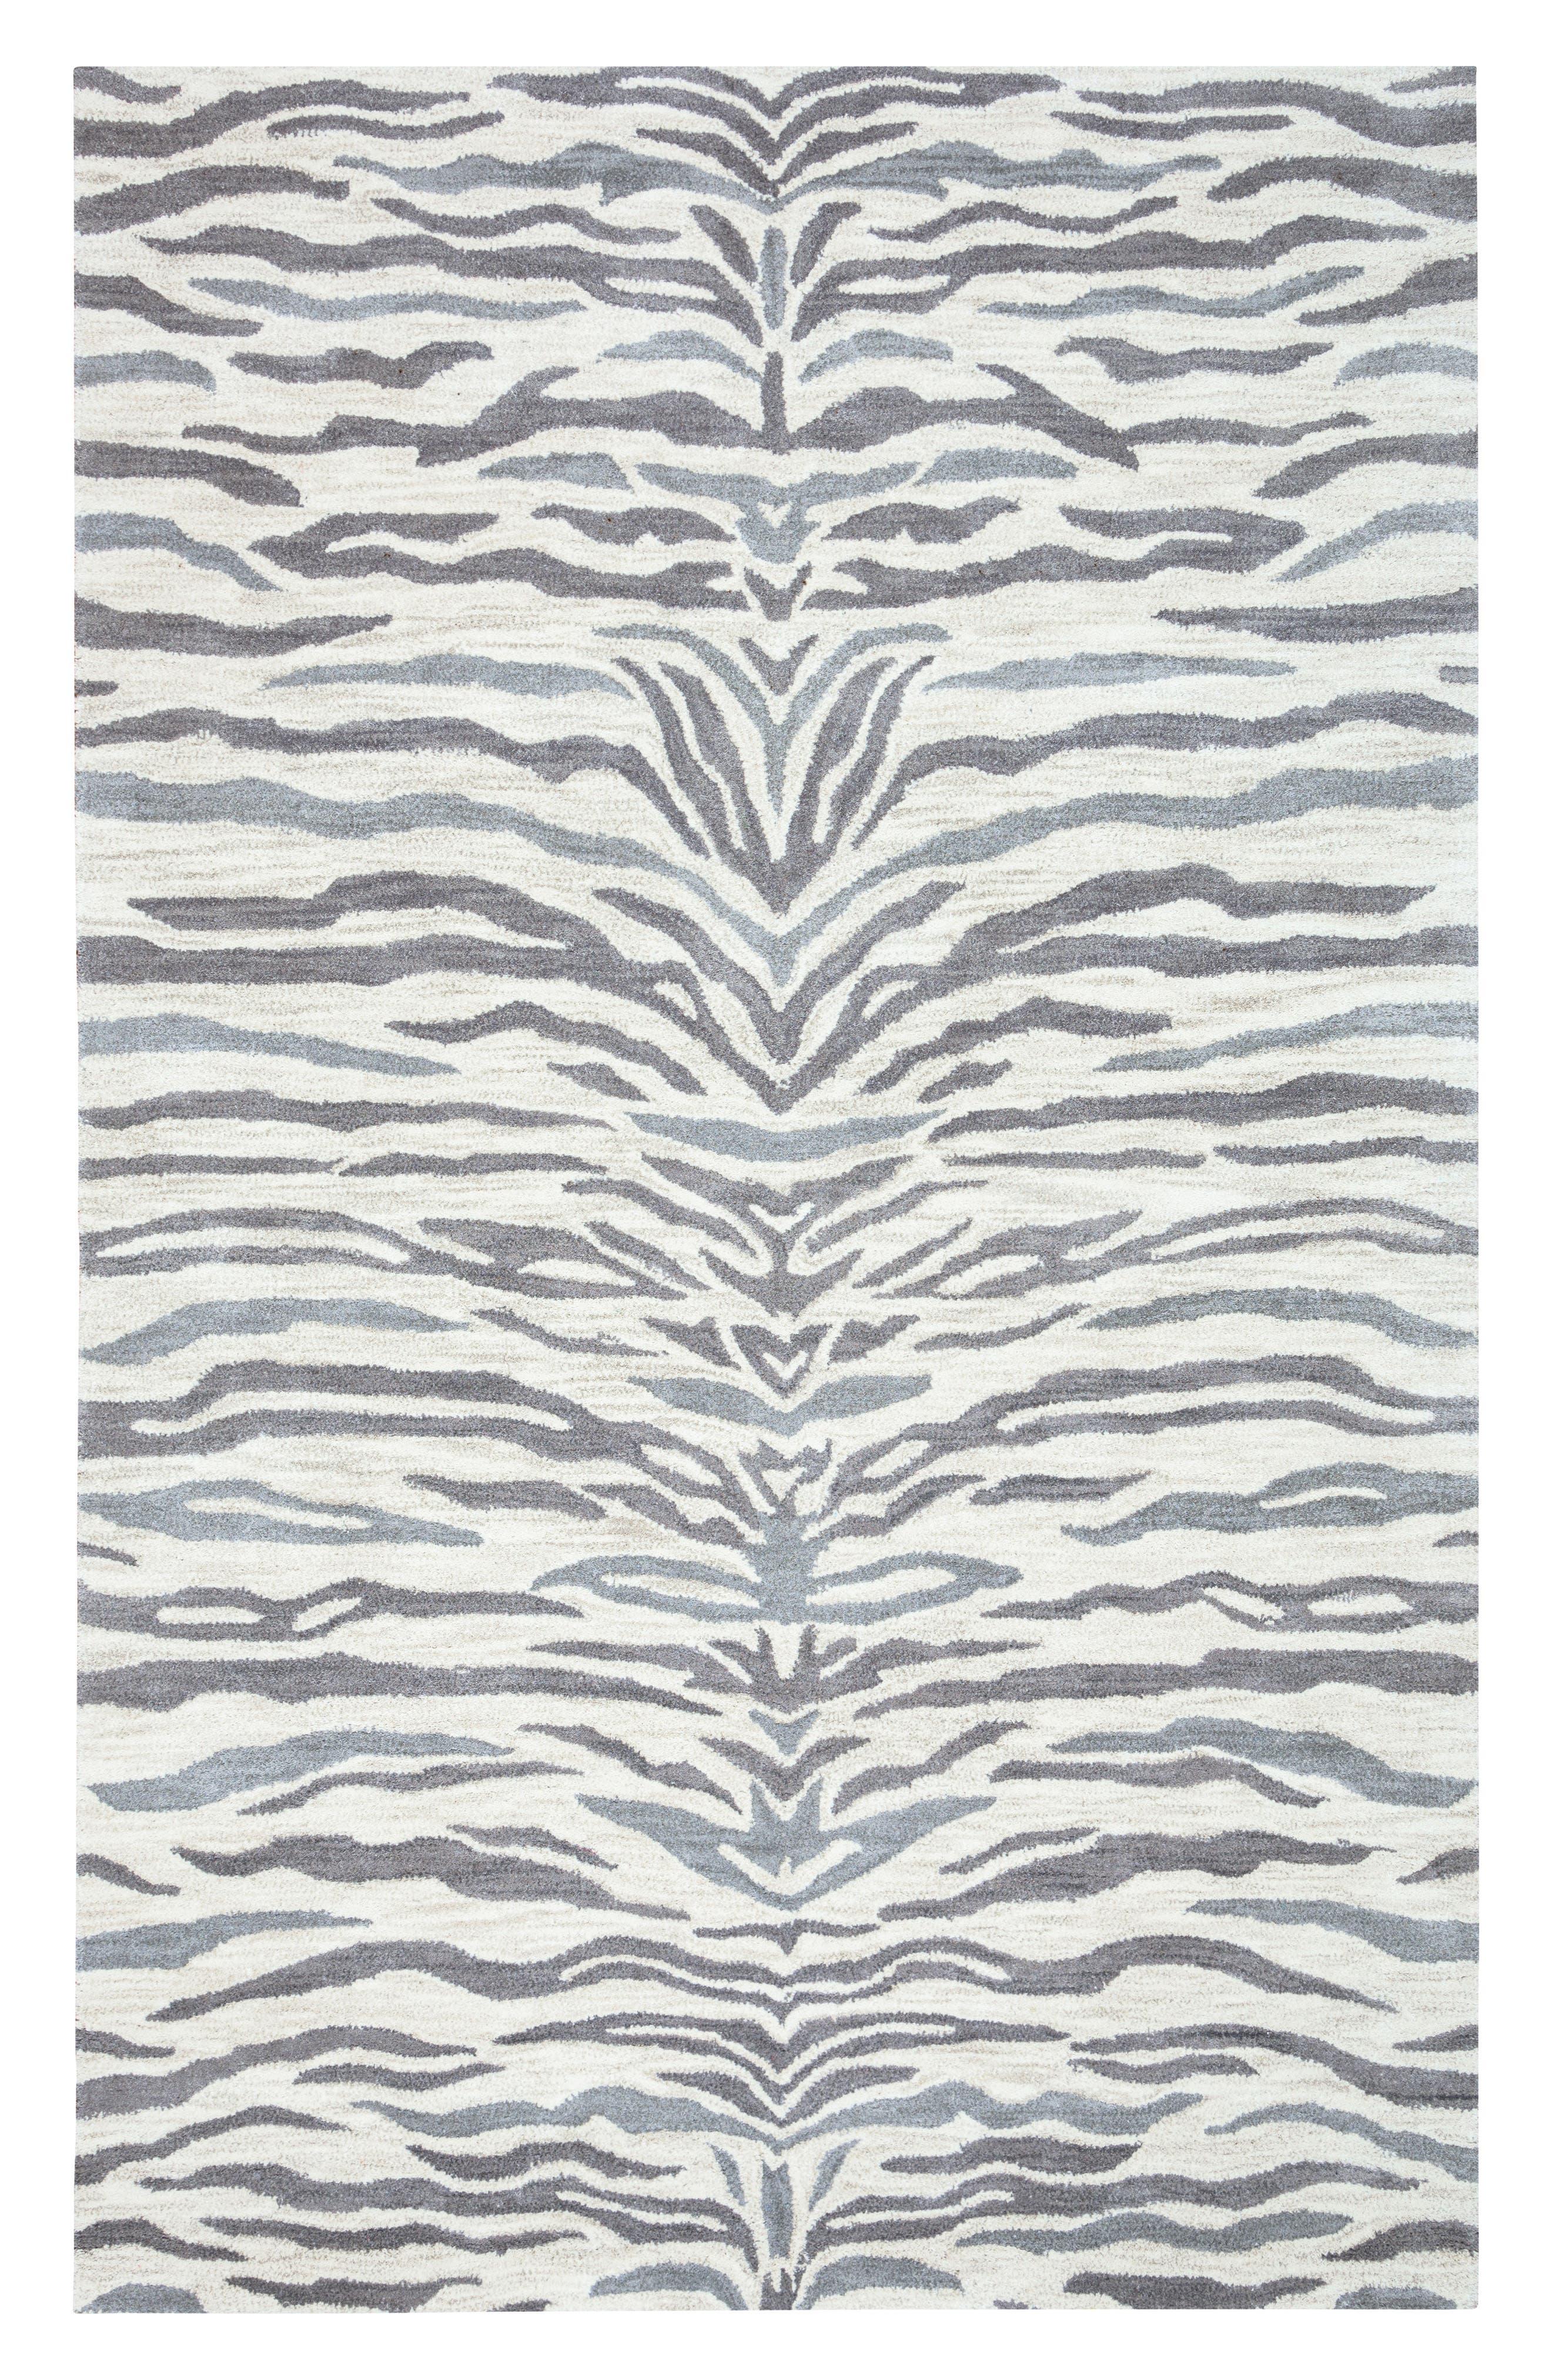 'Valintino Zebra' Hand Tufted Wool Area Rug,                         Main,                         color, 020